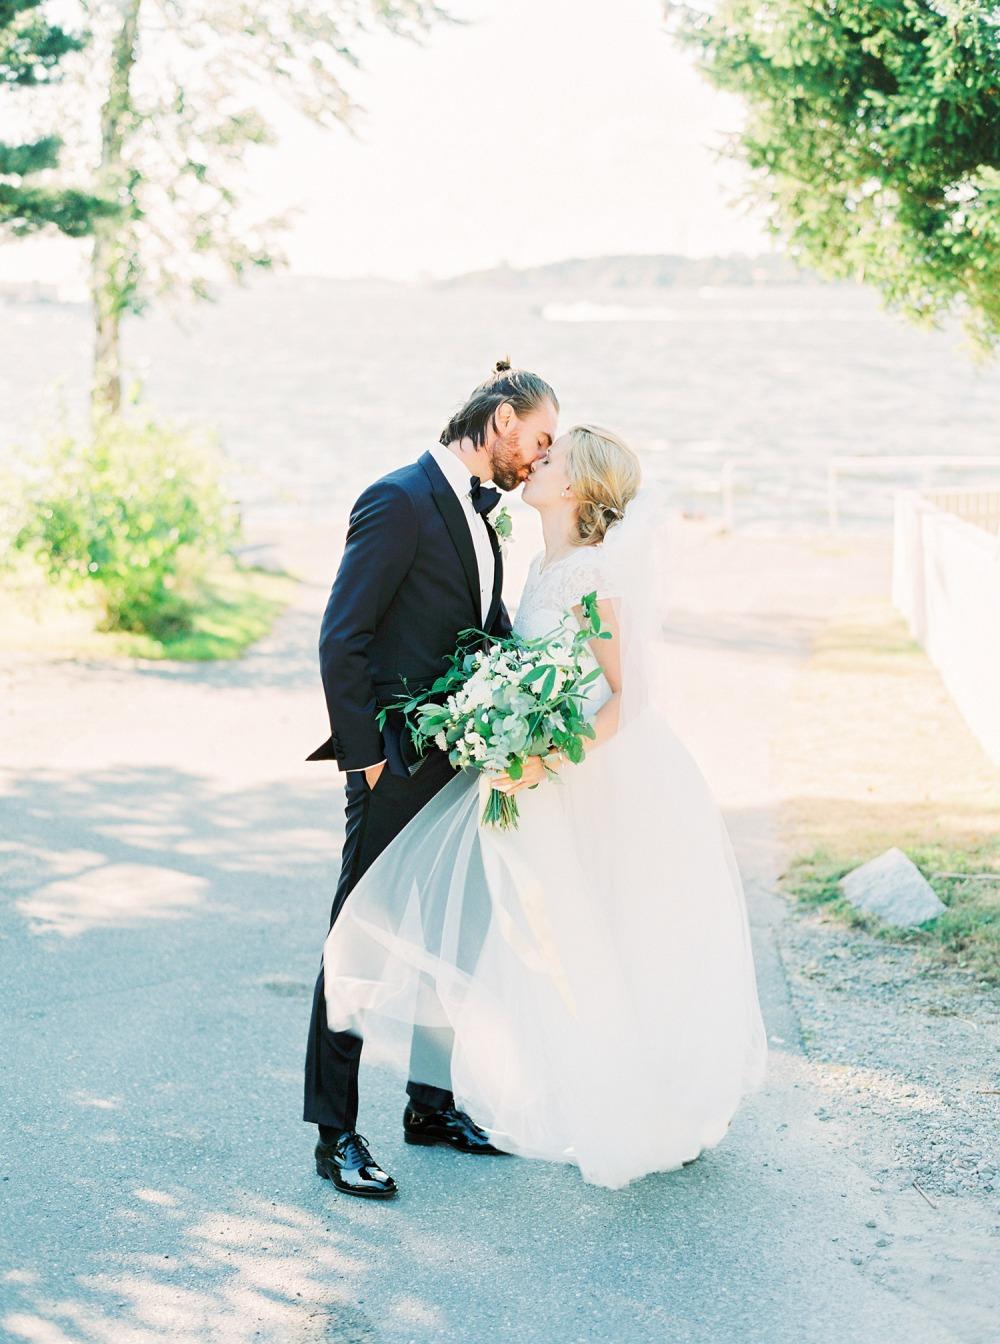 web-2bridesphotography_isabelle_weddings_072